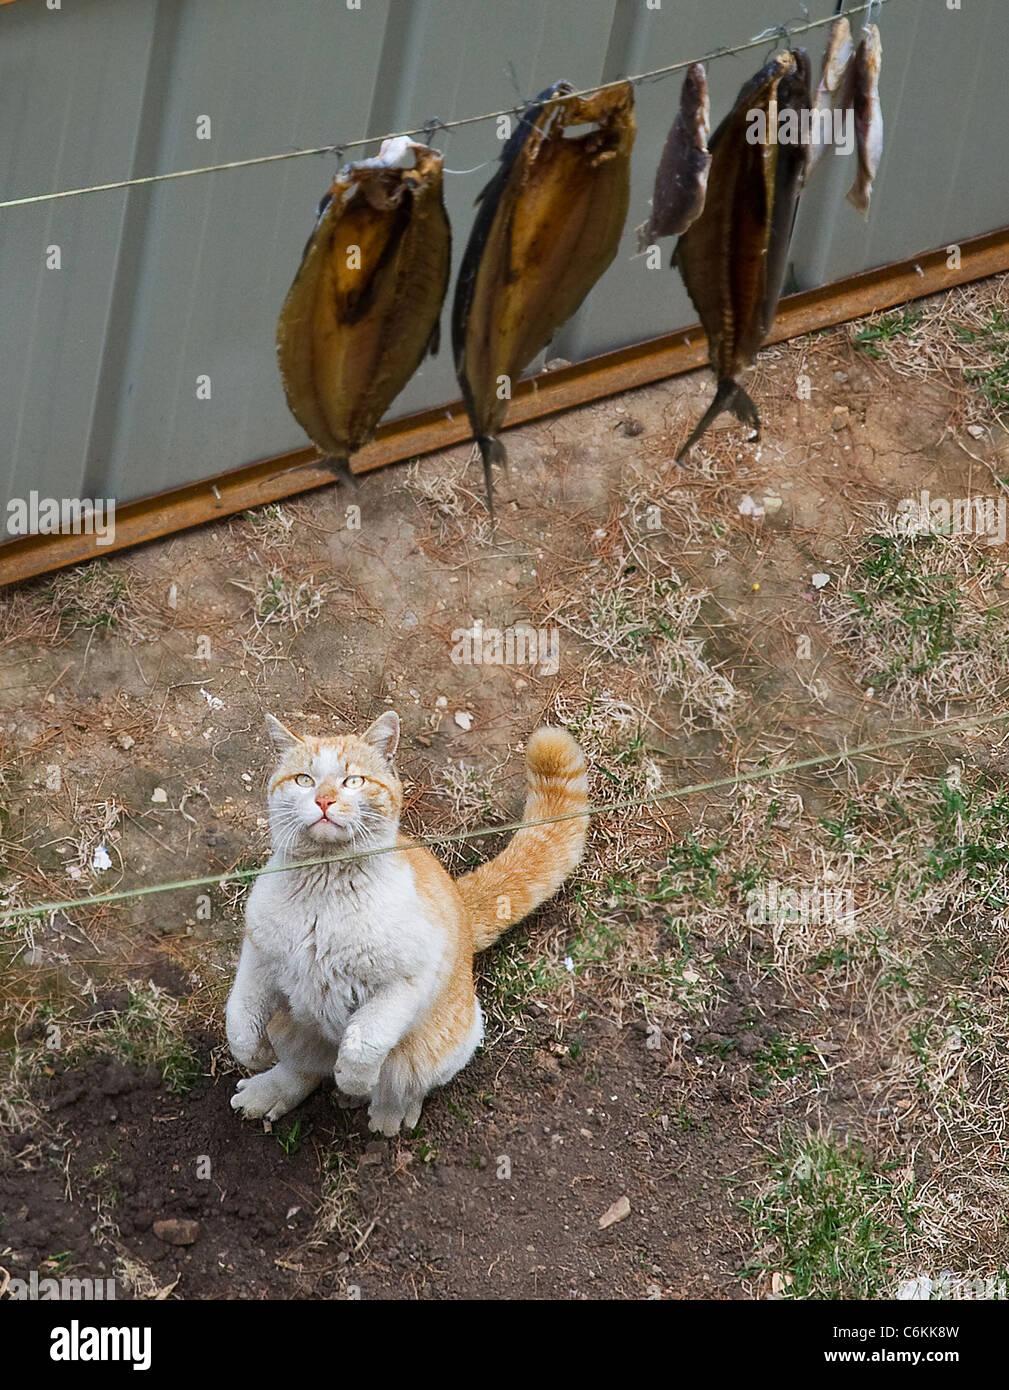 Greedy cat smells something fishy This greedy cat tries desperately